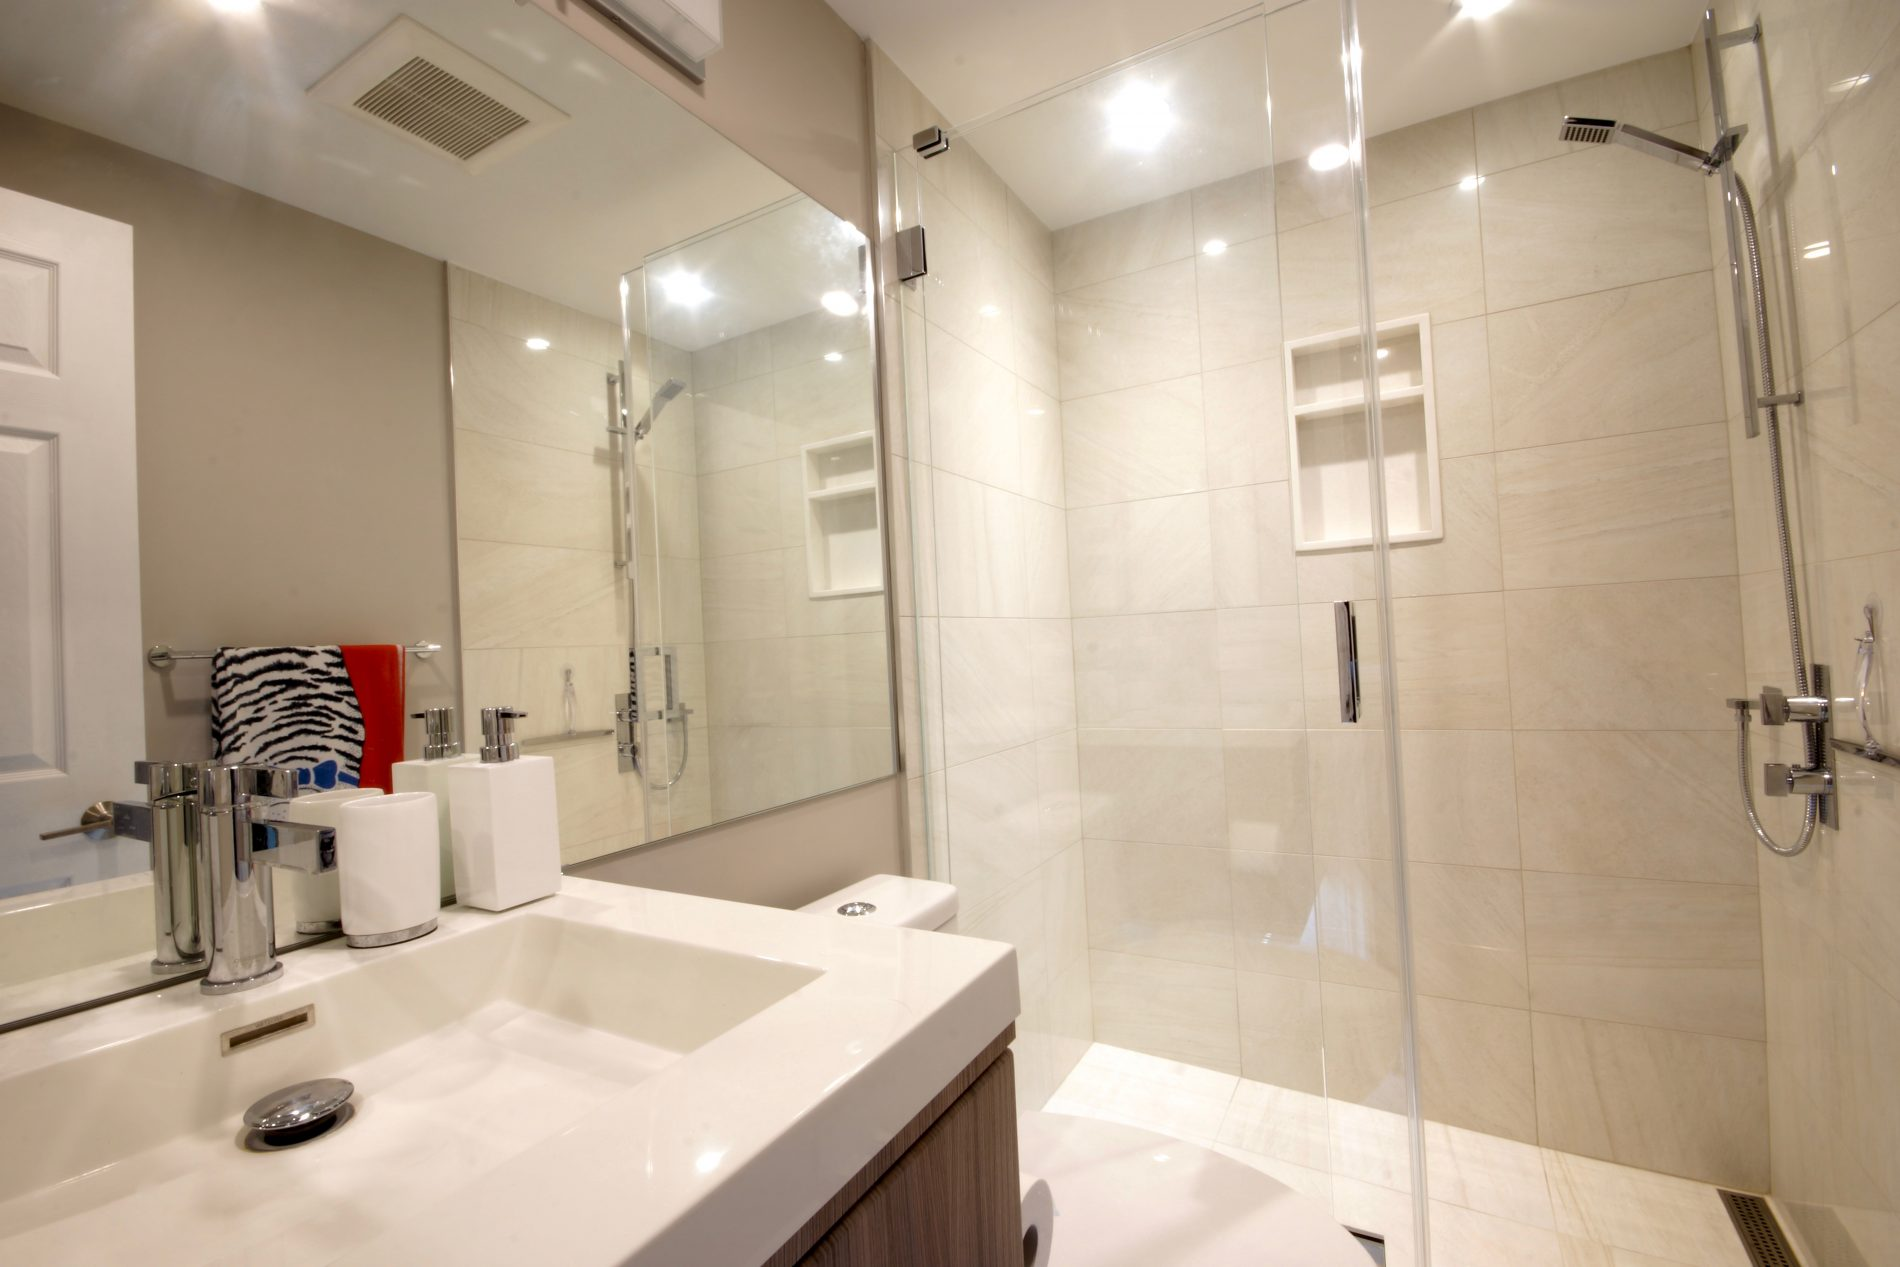 Wagon Trailway – Toronto L' Amoreaux Ensuite, Main Bath, & Powder Room - Featured Image